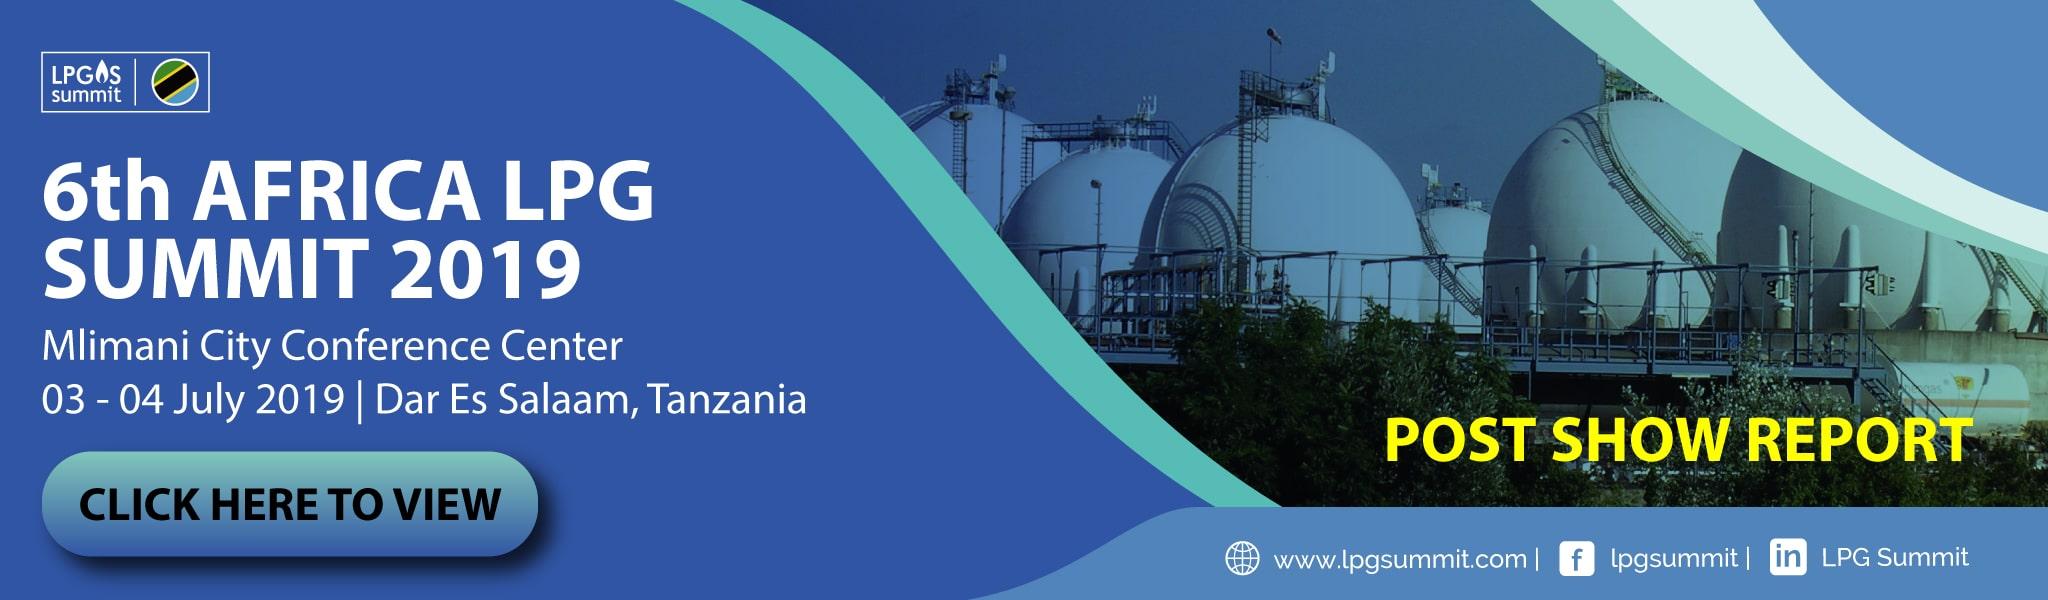 PSR Tanzania LPG Summit